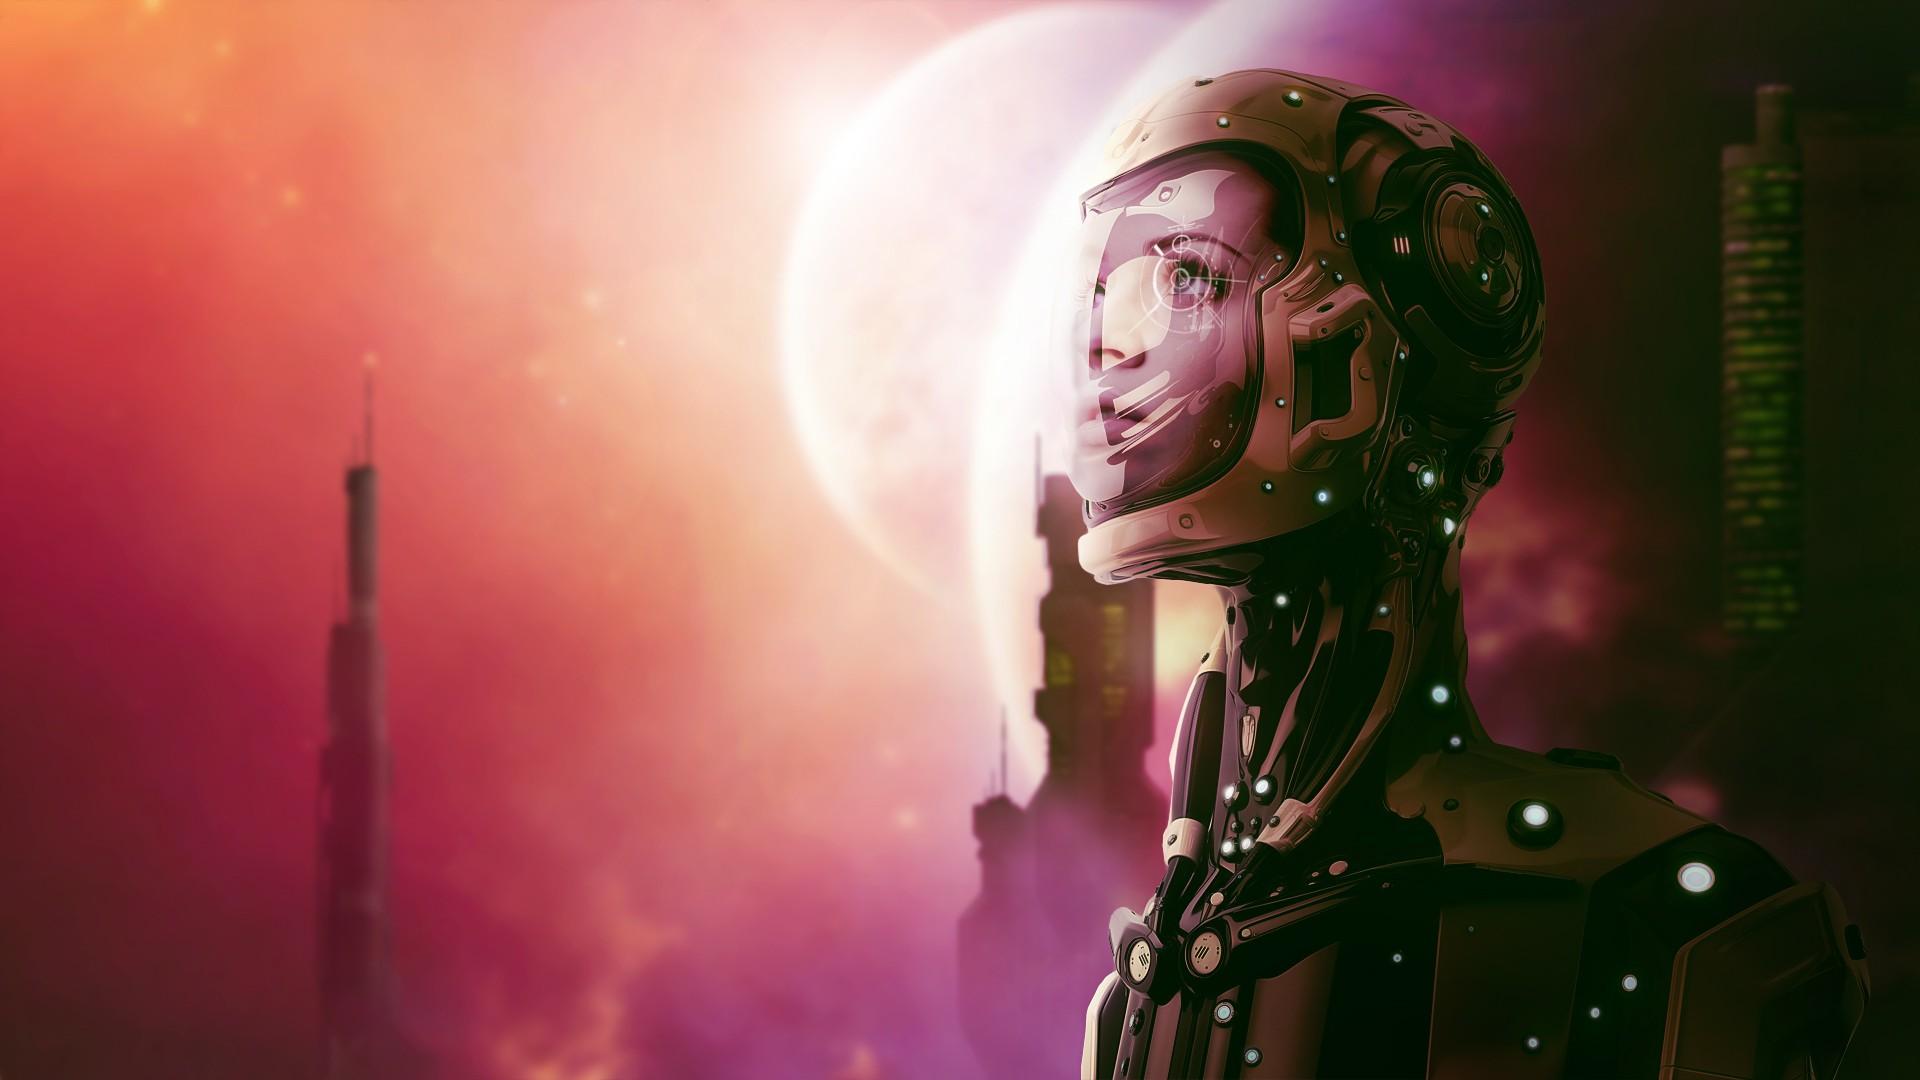 space girl cartoon wallpaper - photo #9